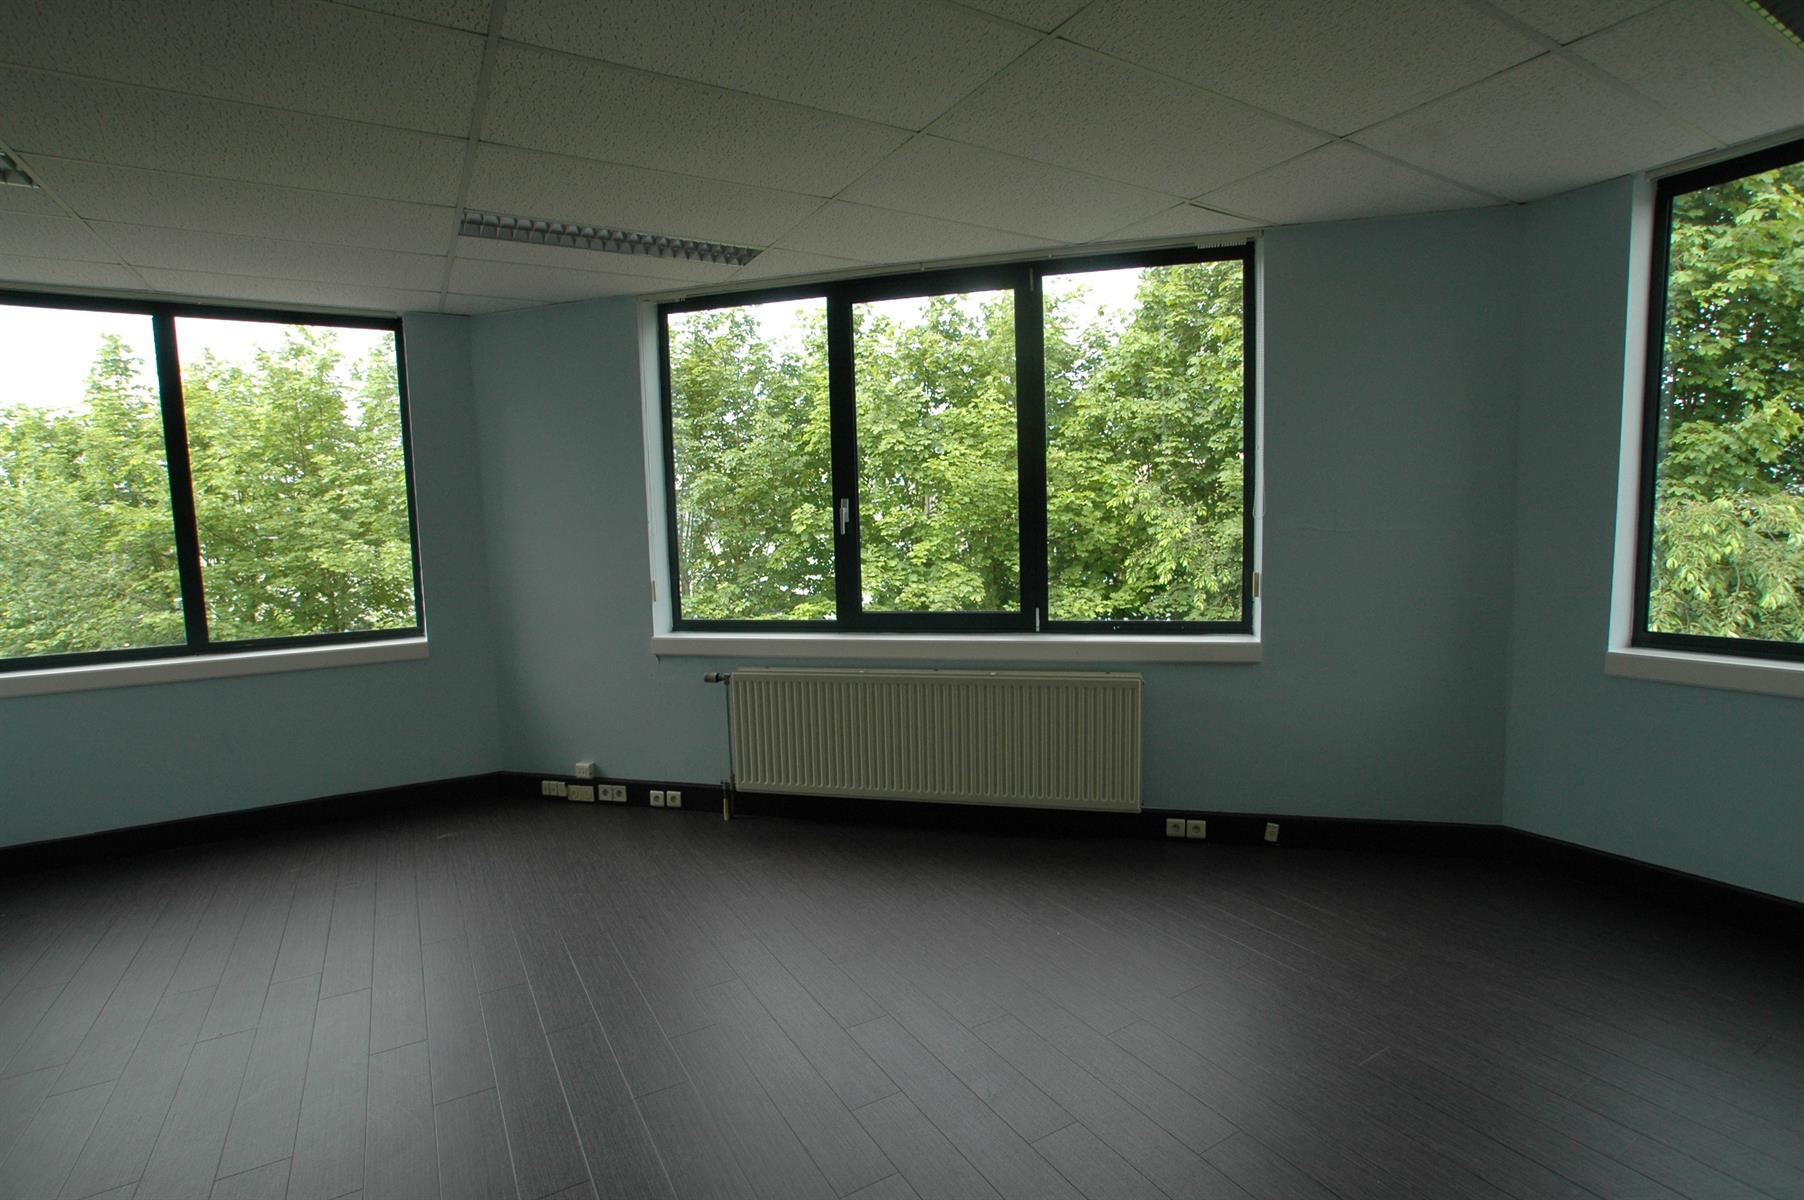 gebouw voor gemengd gebruik te huur UNIT H : MAGAZIJN 547m² MET KANTOOR 288m² - Ingberthoeveweg 3, 2630 Aartselaar, België 7